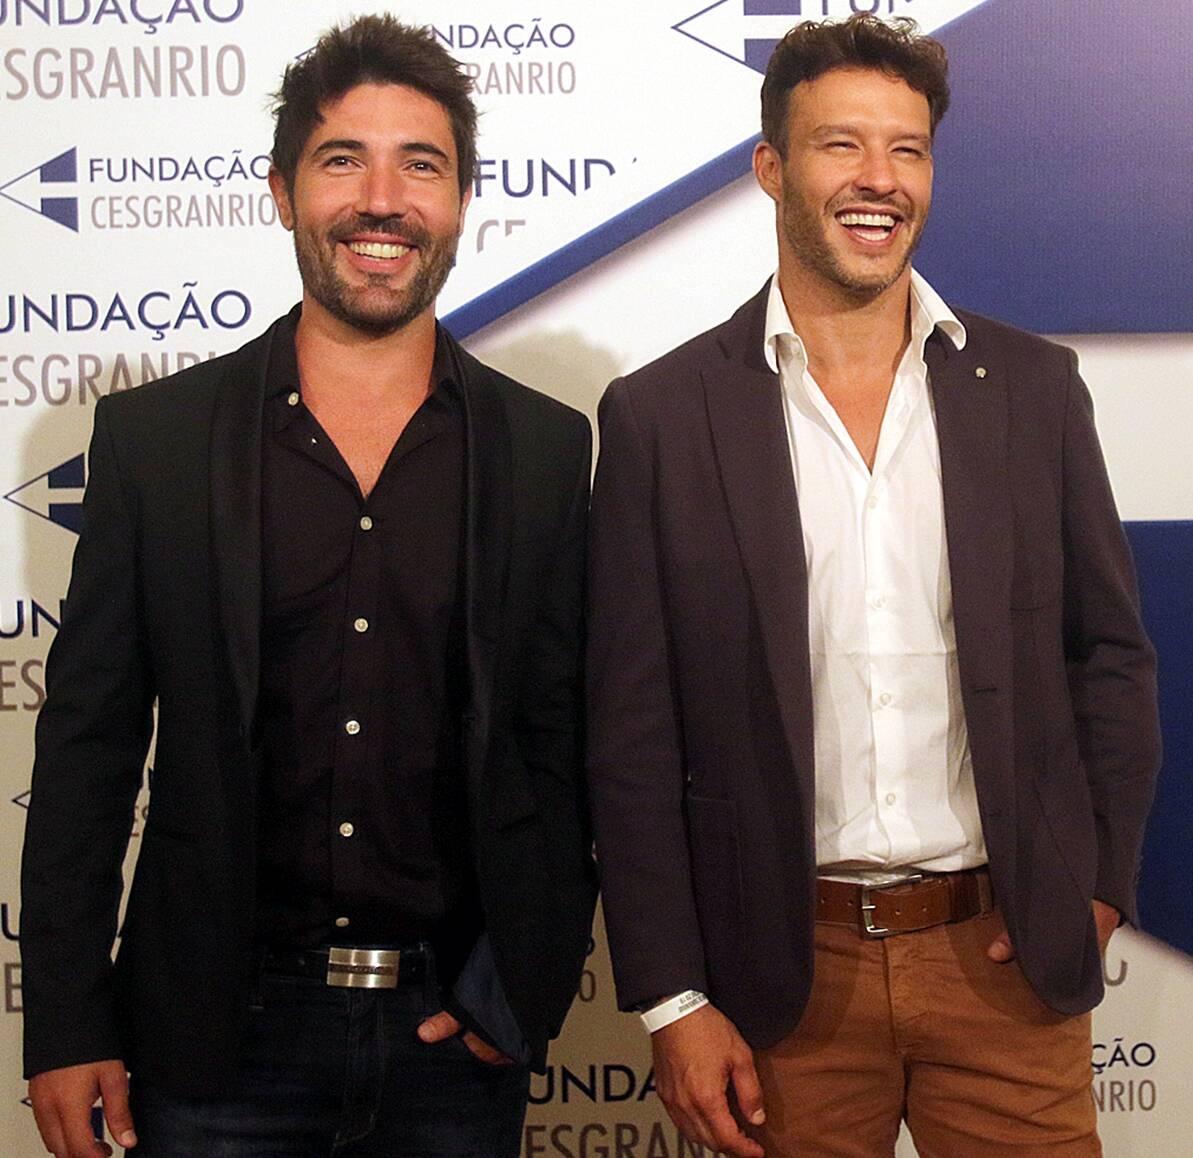 Os atores Sandro Pedroso e Nando Rodrigues /Foto: Eny Miranda